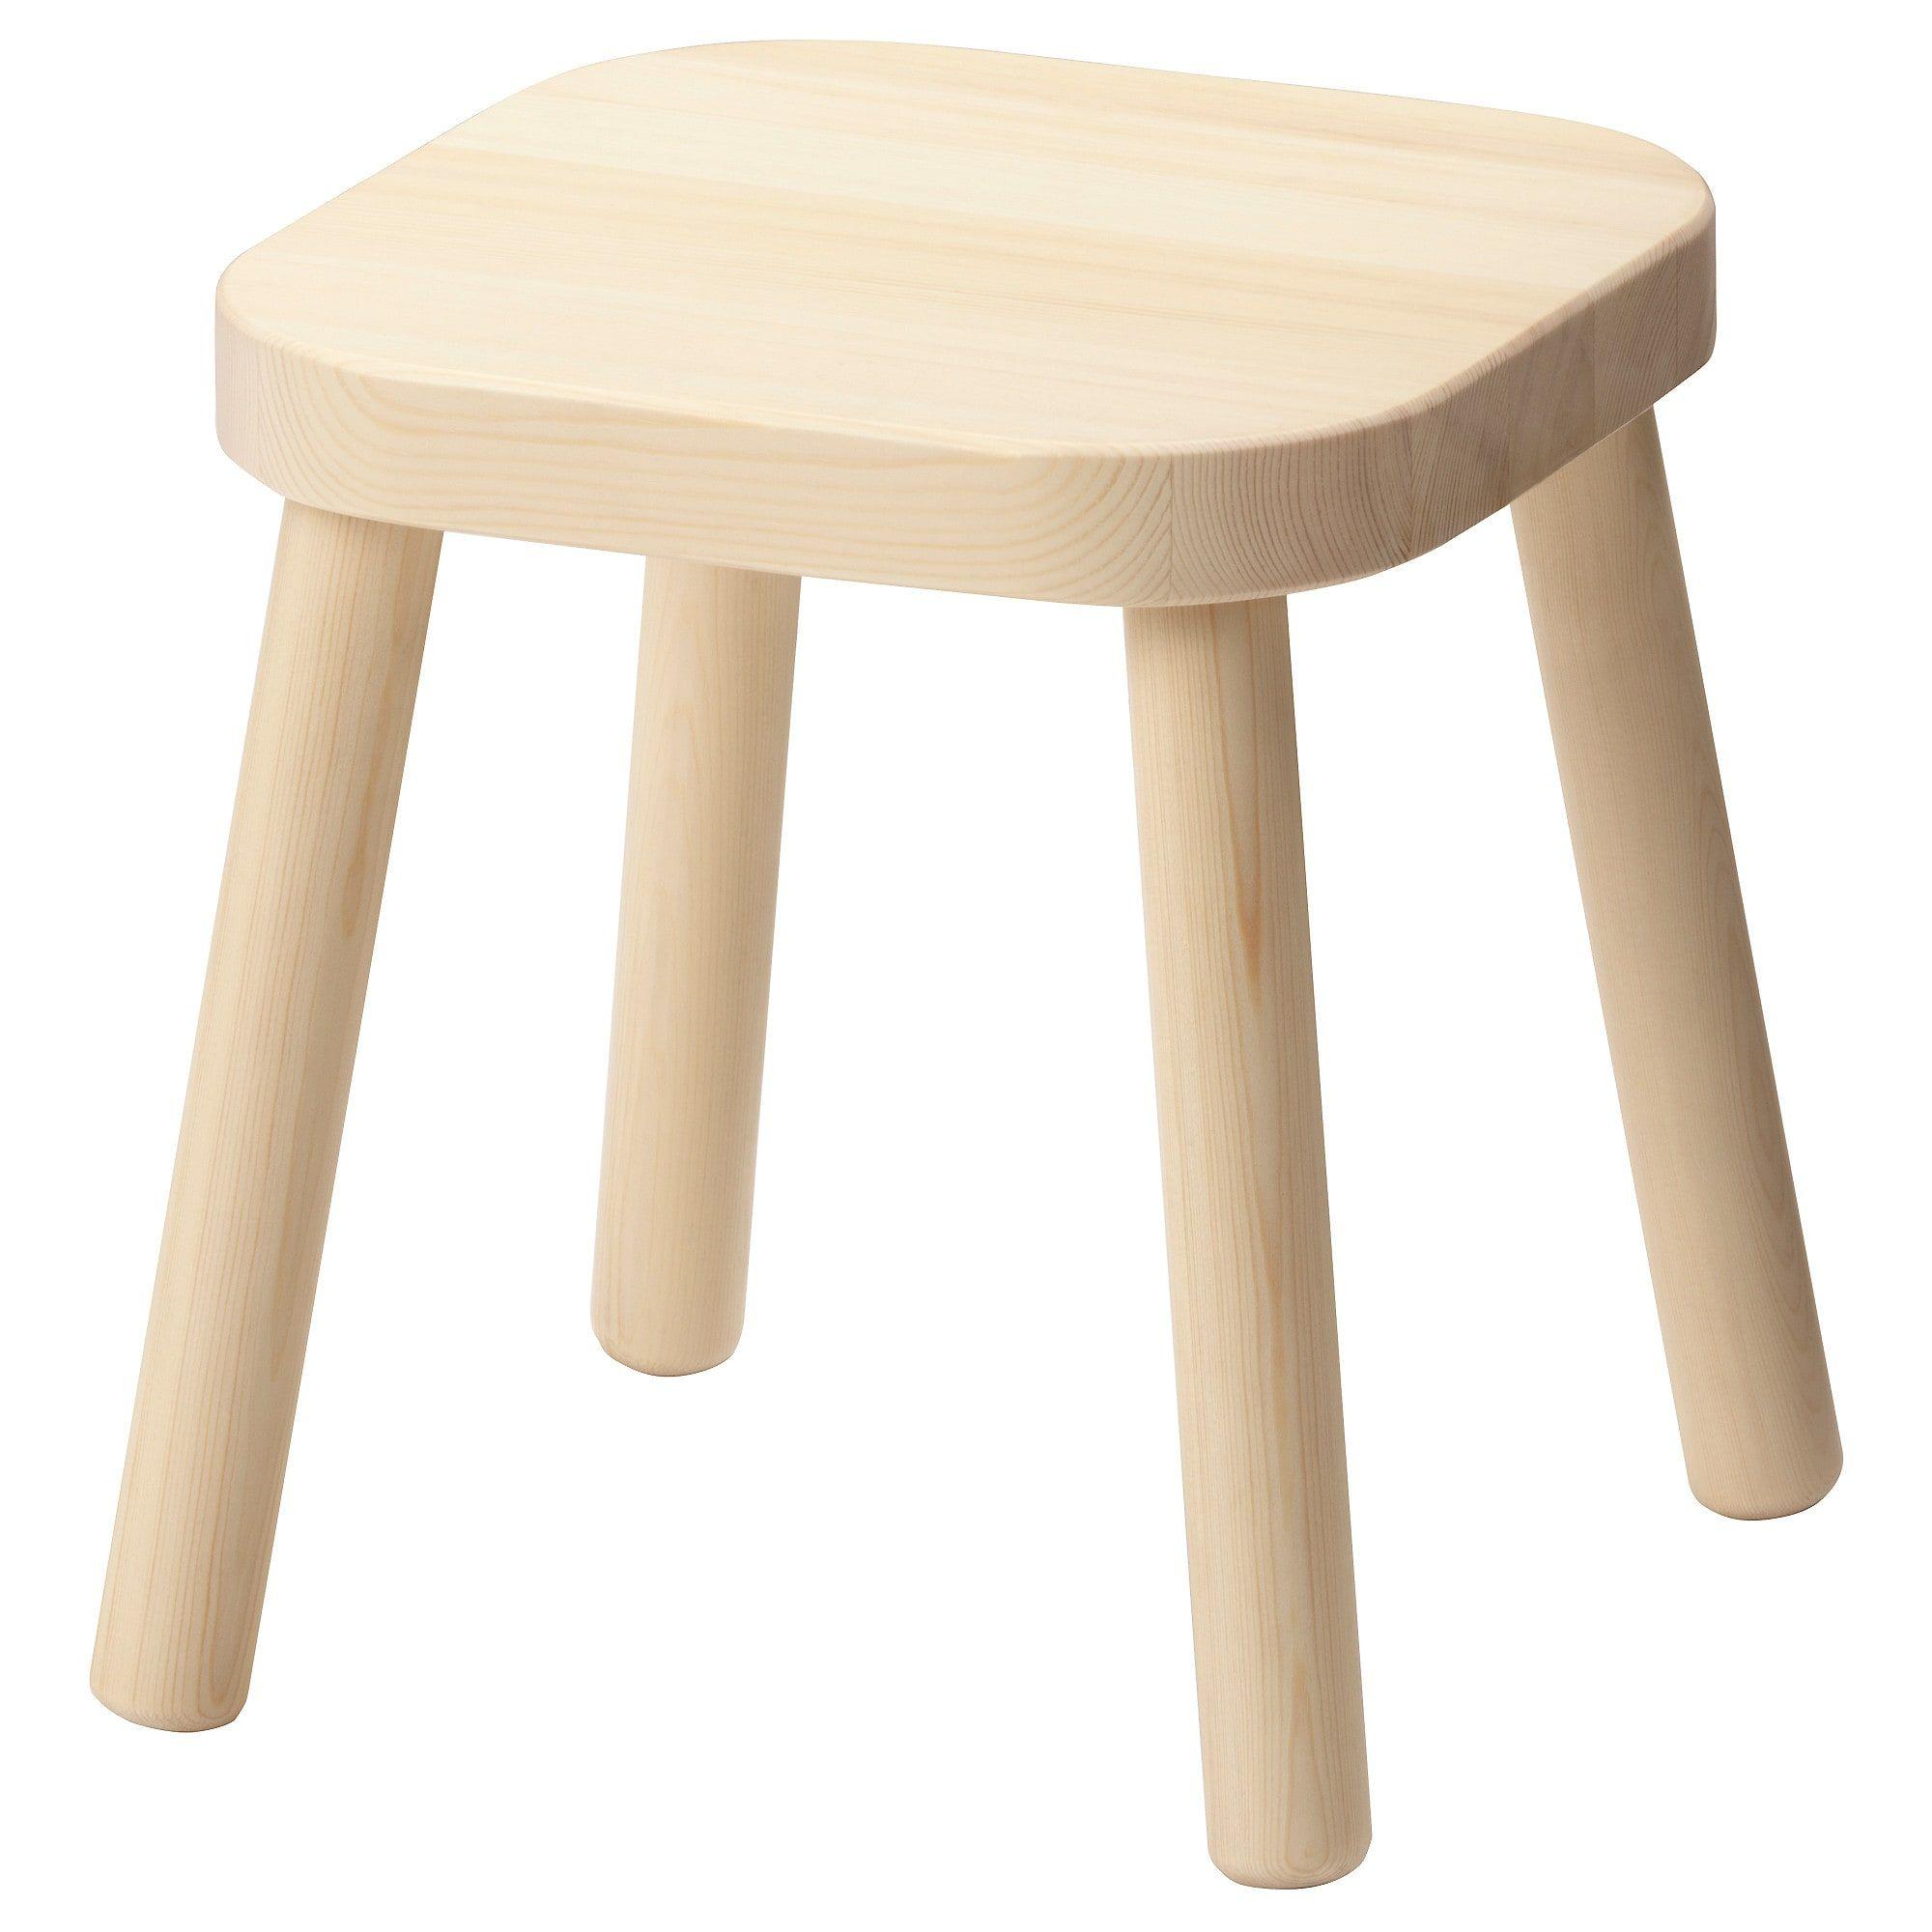 Sensational Ikea Flisat Childrens Stool In 2019 Kids Stool Ikea Kids Creativecarmelina Interior Chair Design Creativecarmelinacom